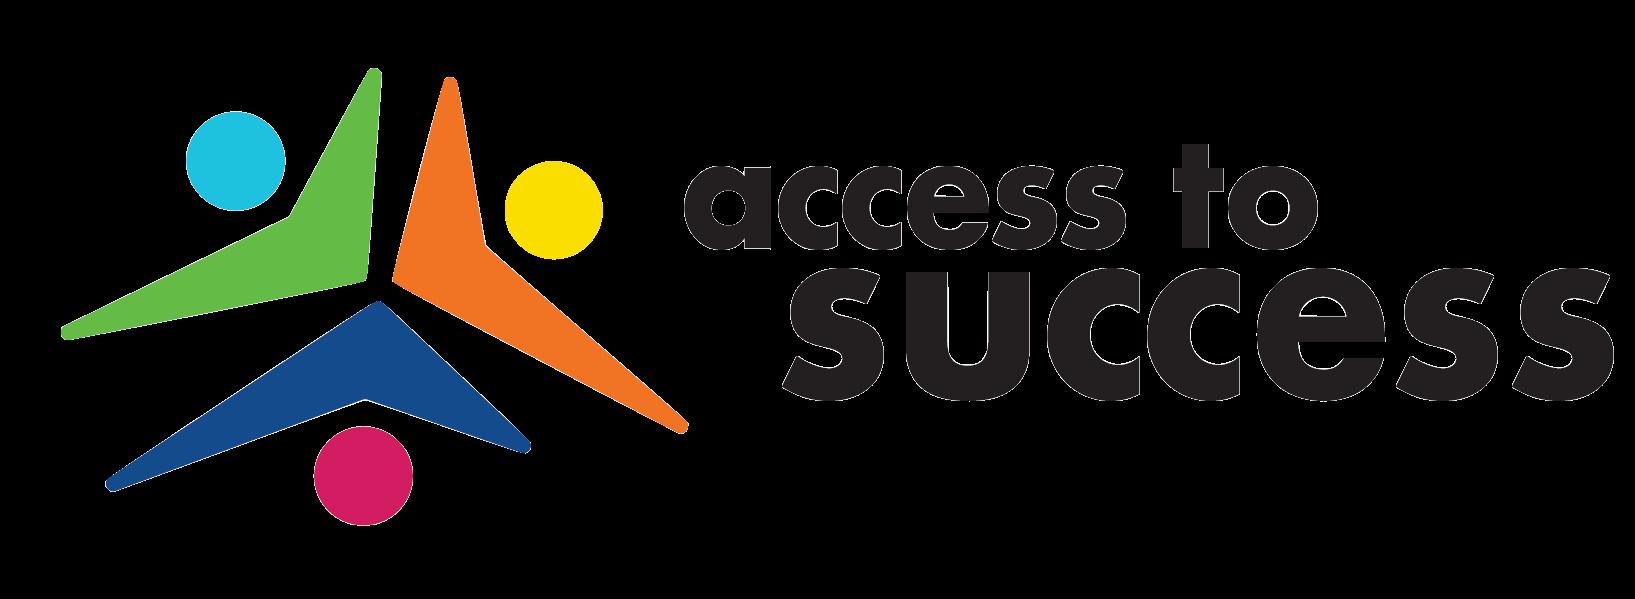 Access to Success Organization logo